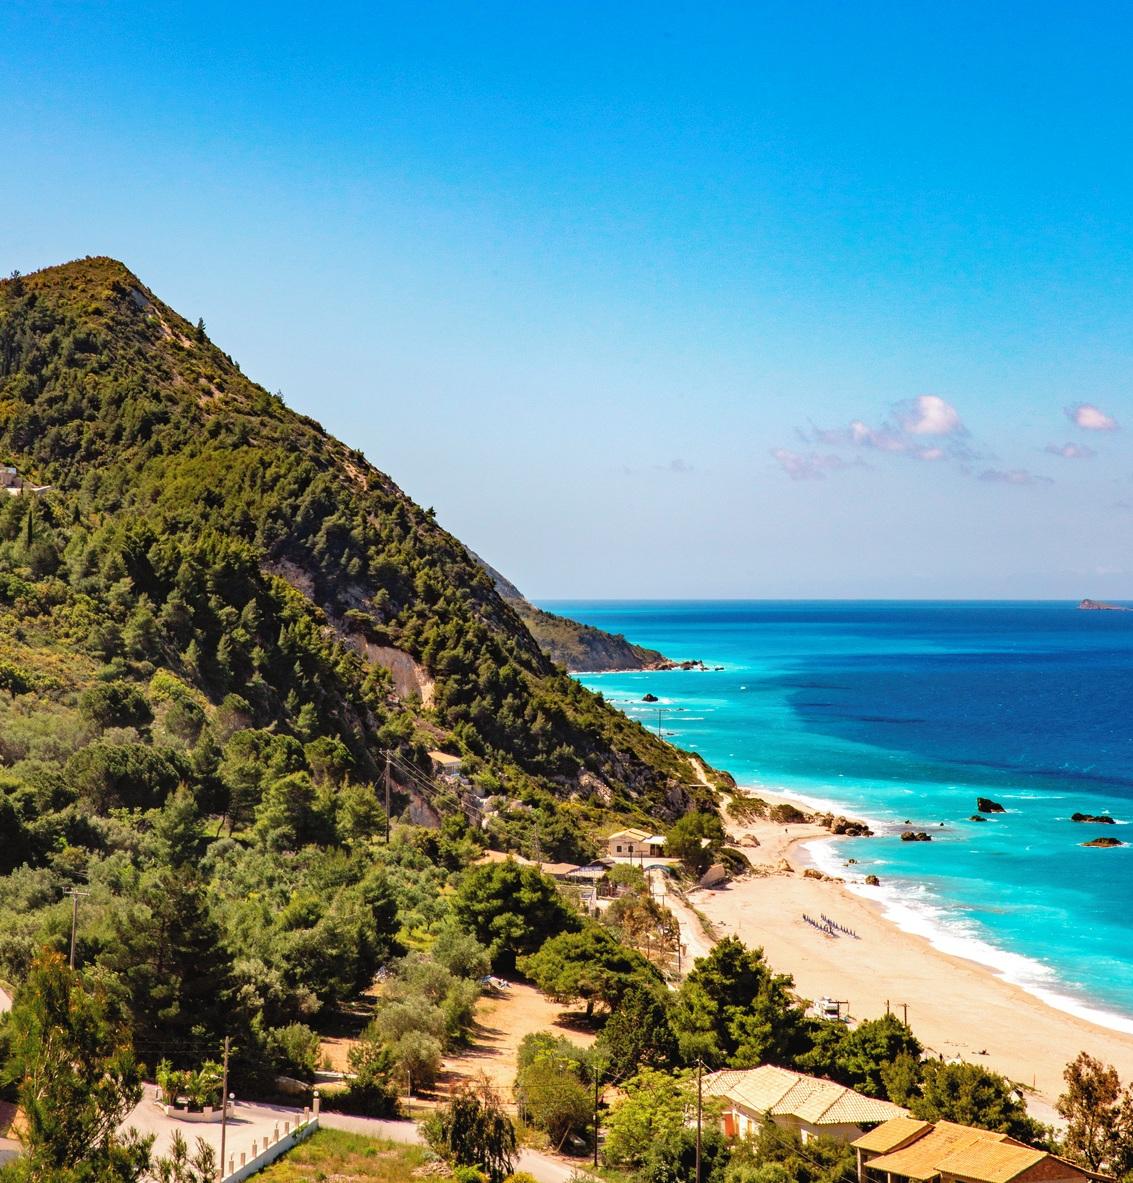 Lefkas greek island